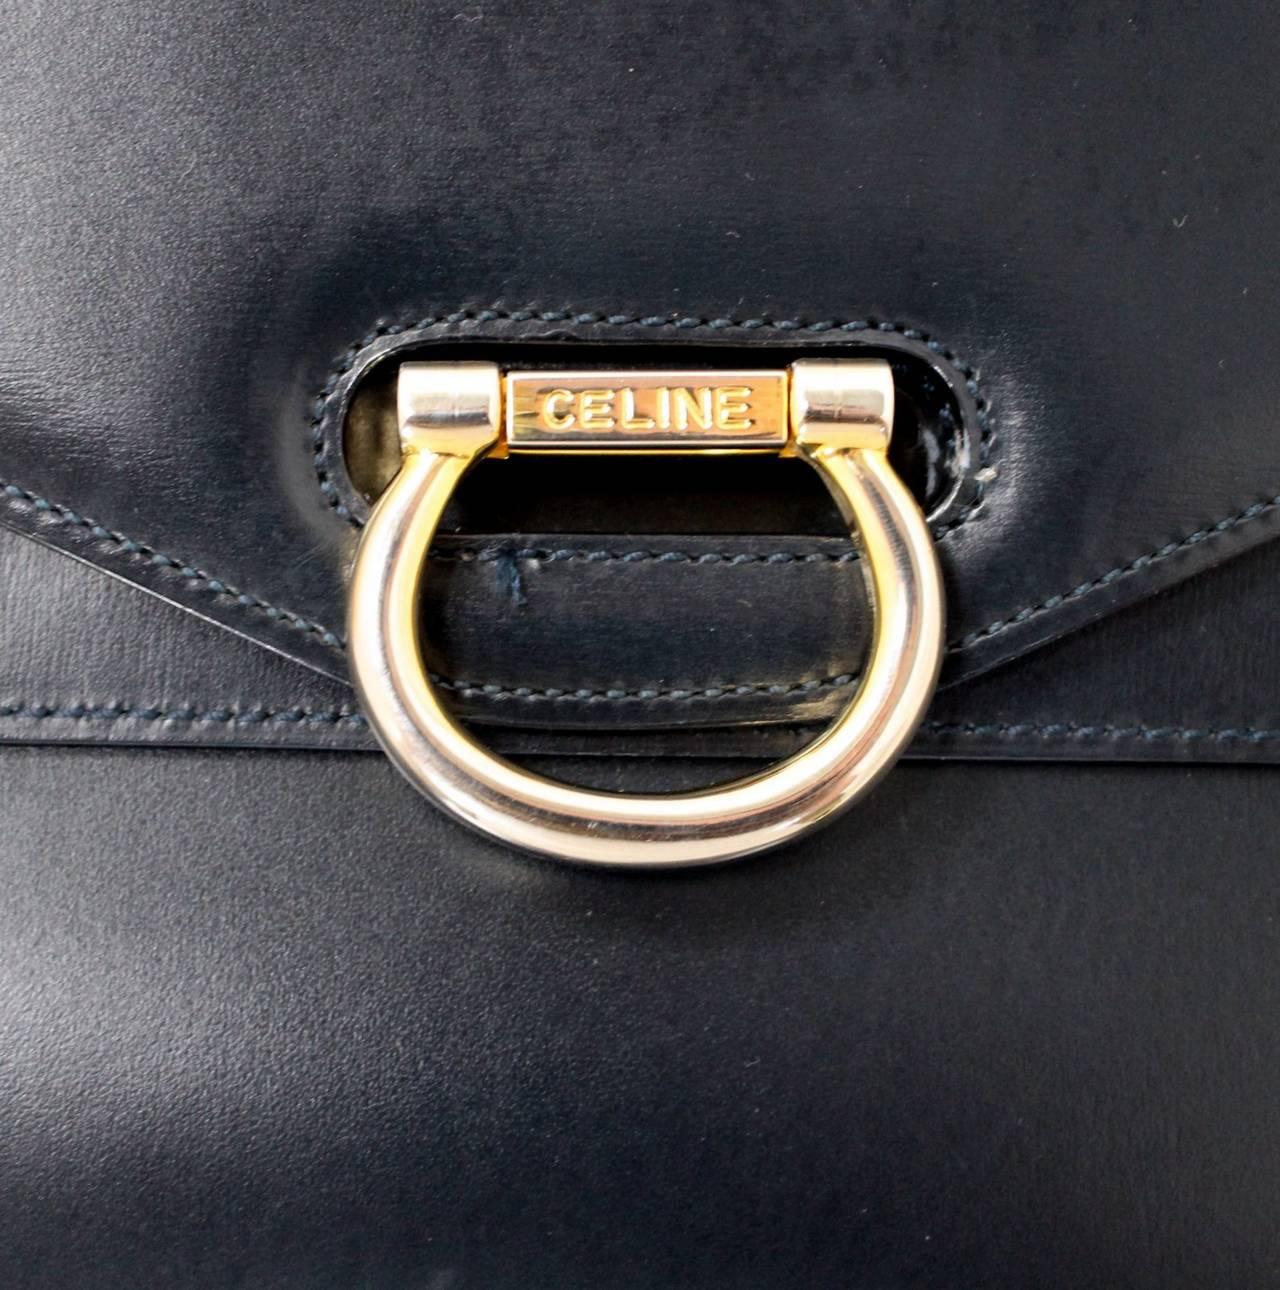 celine navy leather handbag boogie